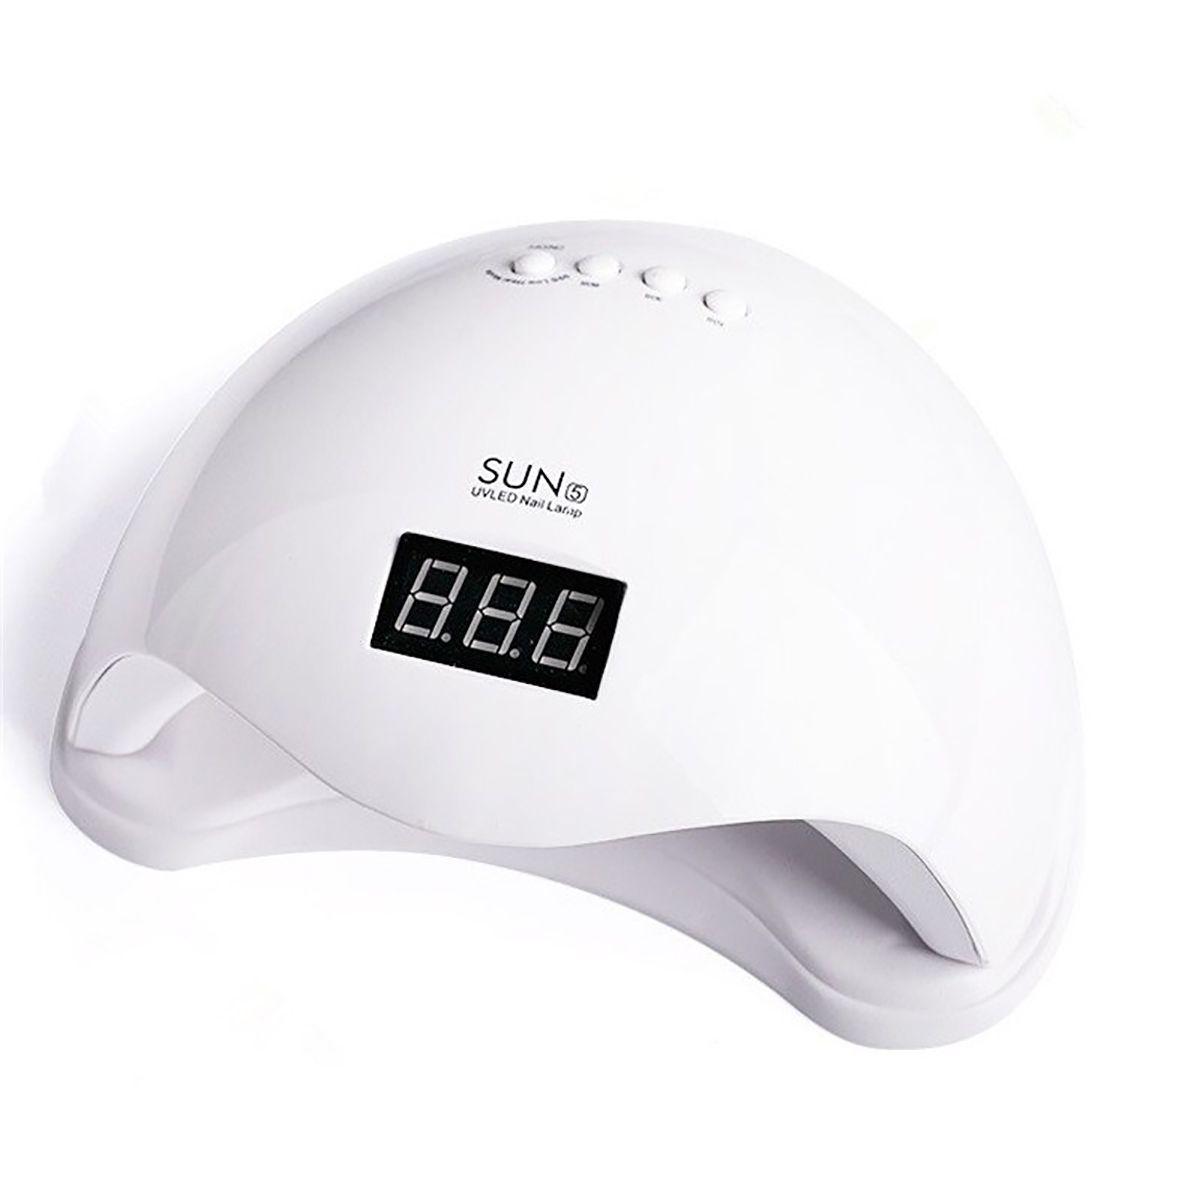 Cabine Led UV Sun 5 48W Bivolt Digital Temporizador Sensor